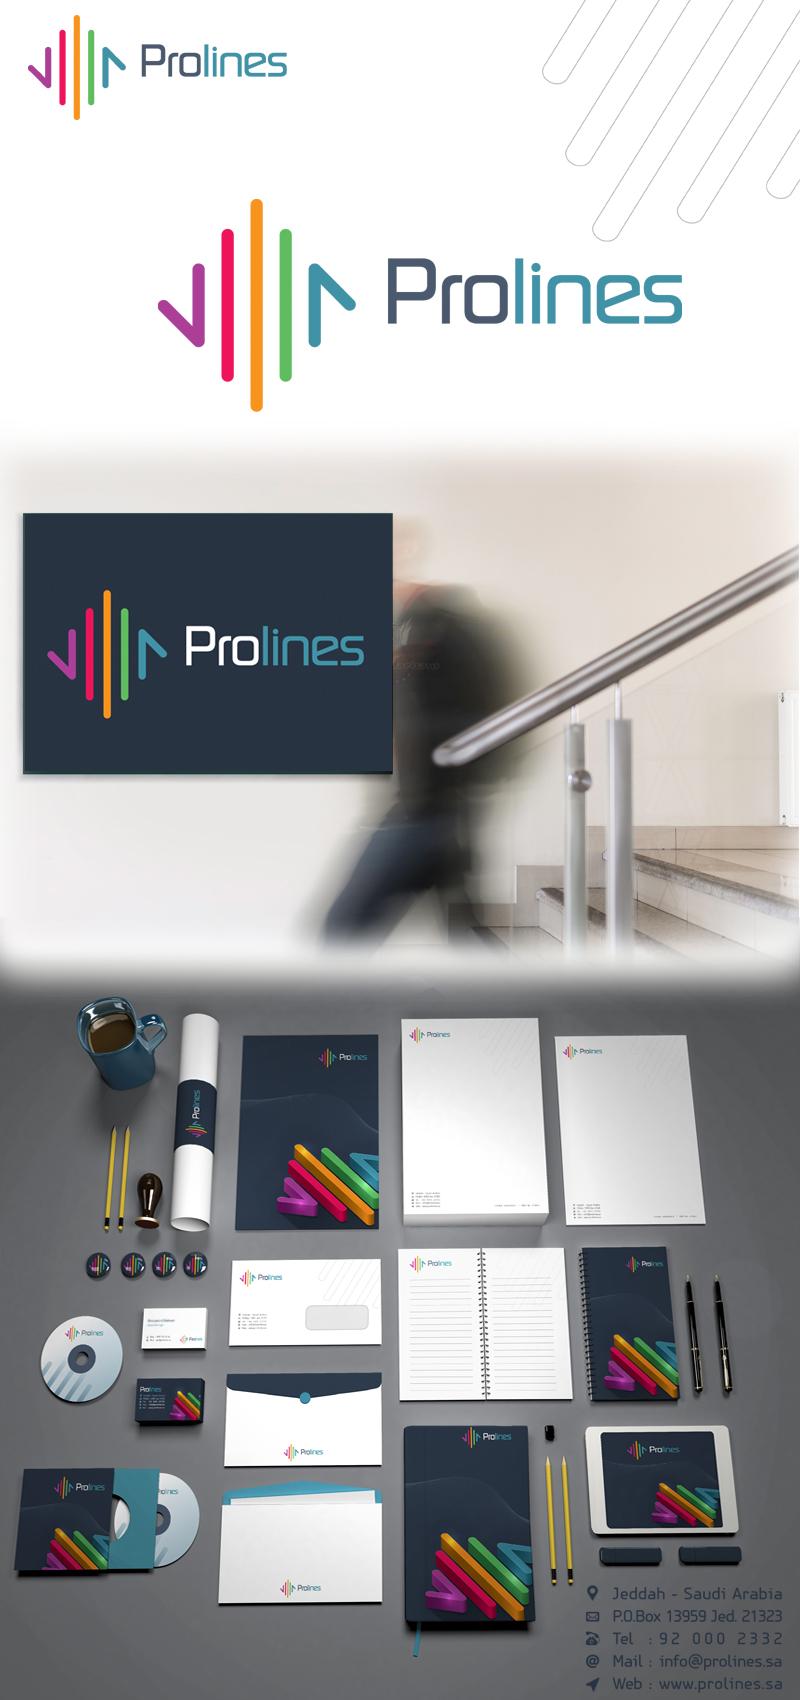 prolines-brand